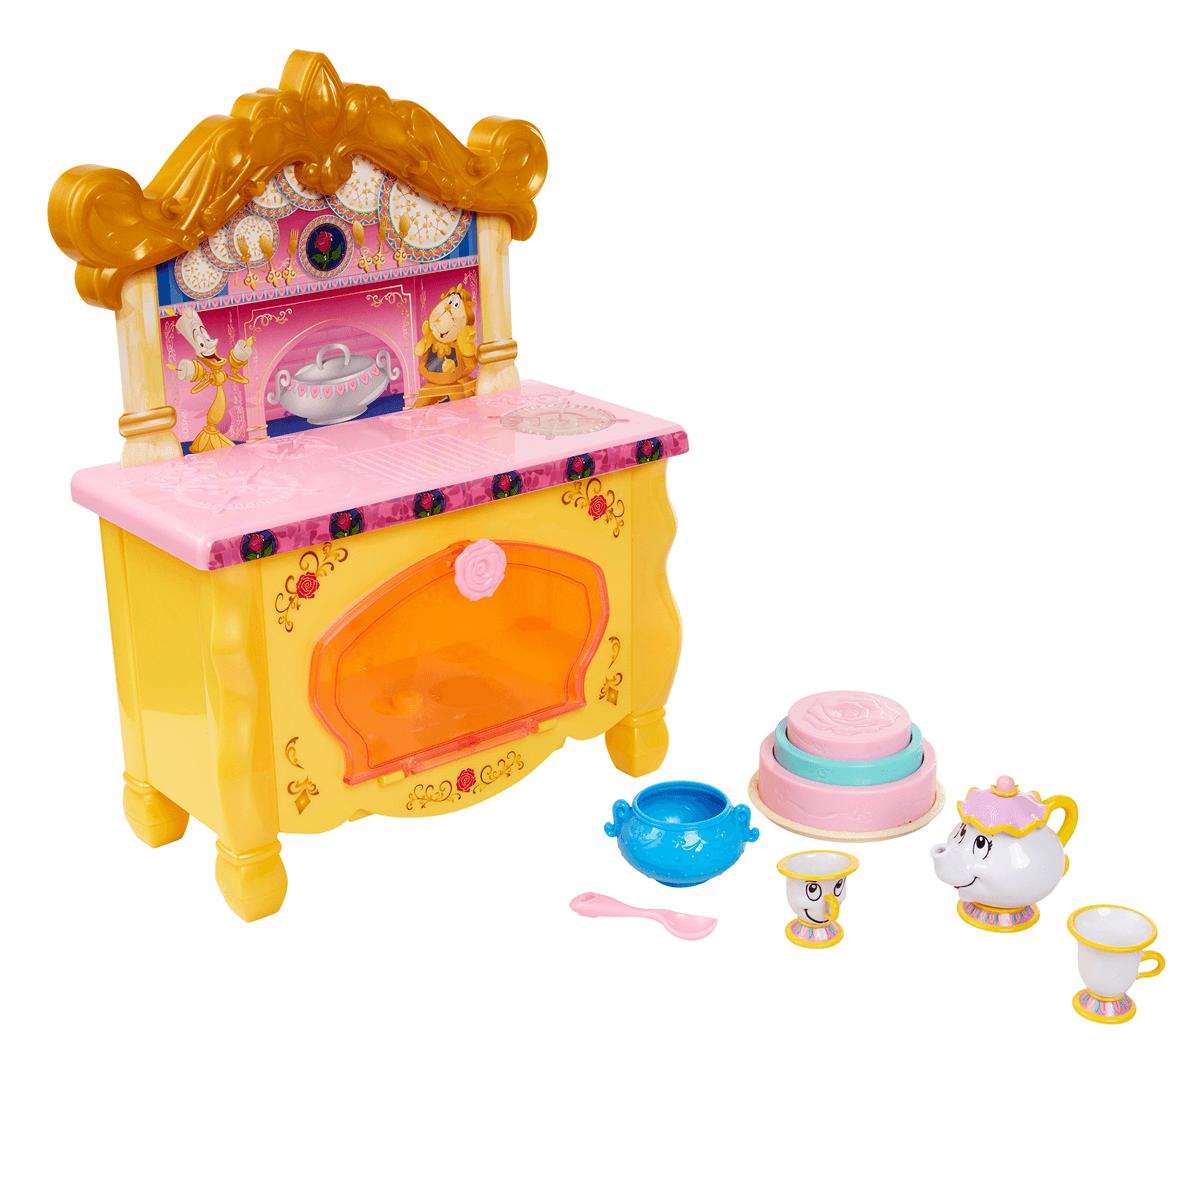 Disney Princess Belle's Enchanted Kitchen